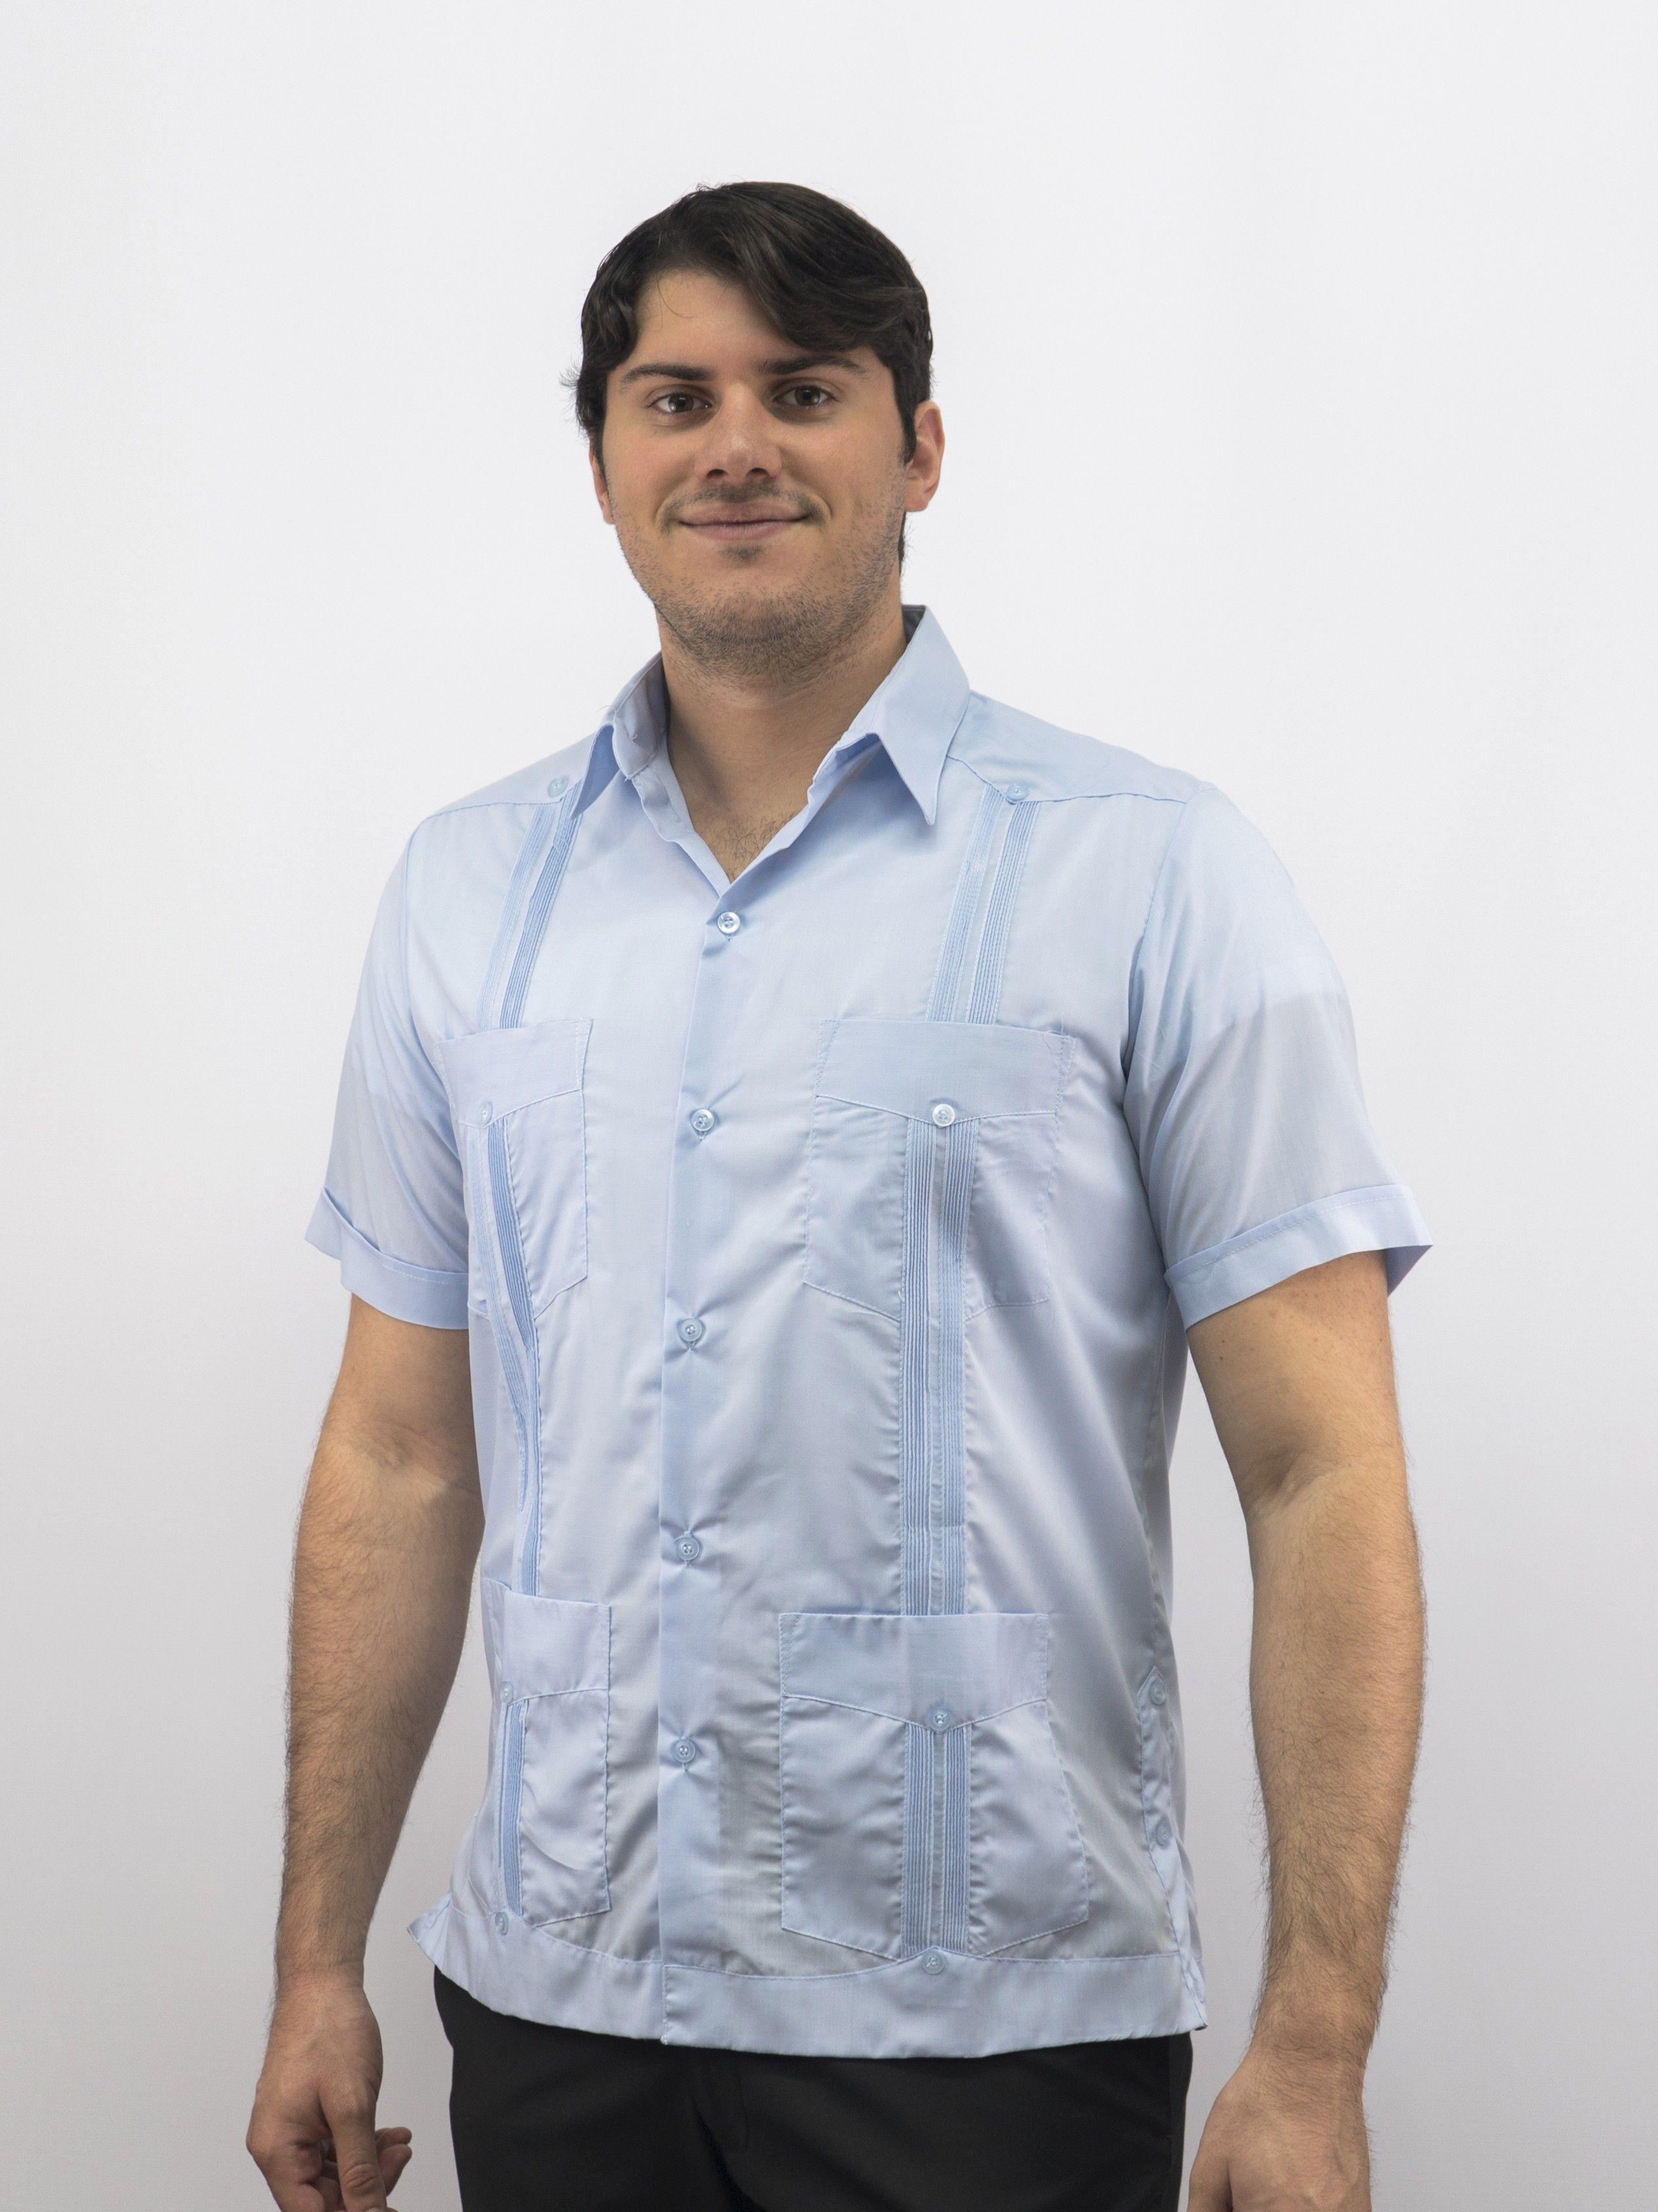 Men S Authentic Cuban Guayabera Shirt 100 Linen Blue D Accord 2263 Cuban Guayabera Guayabera Mexican Wedding Shirt